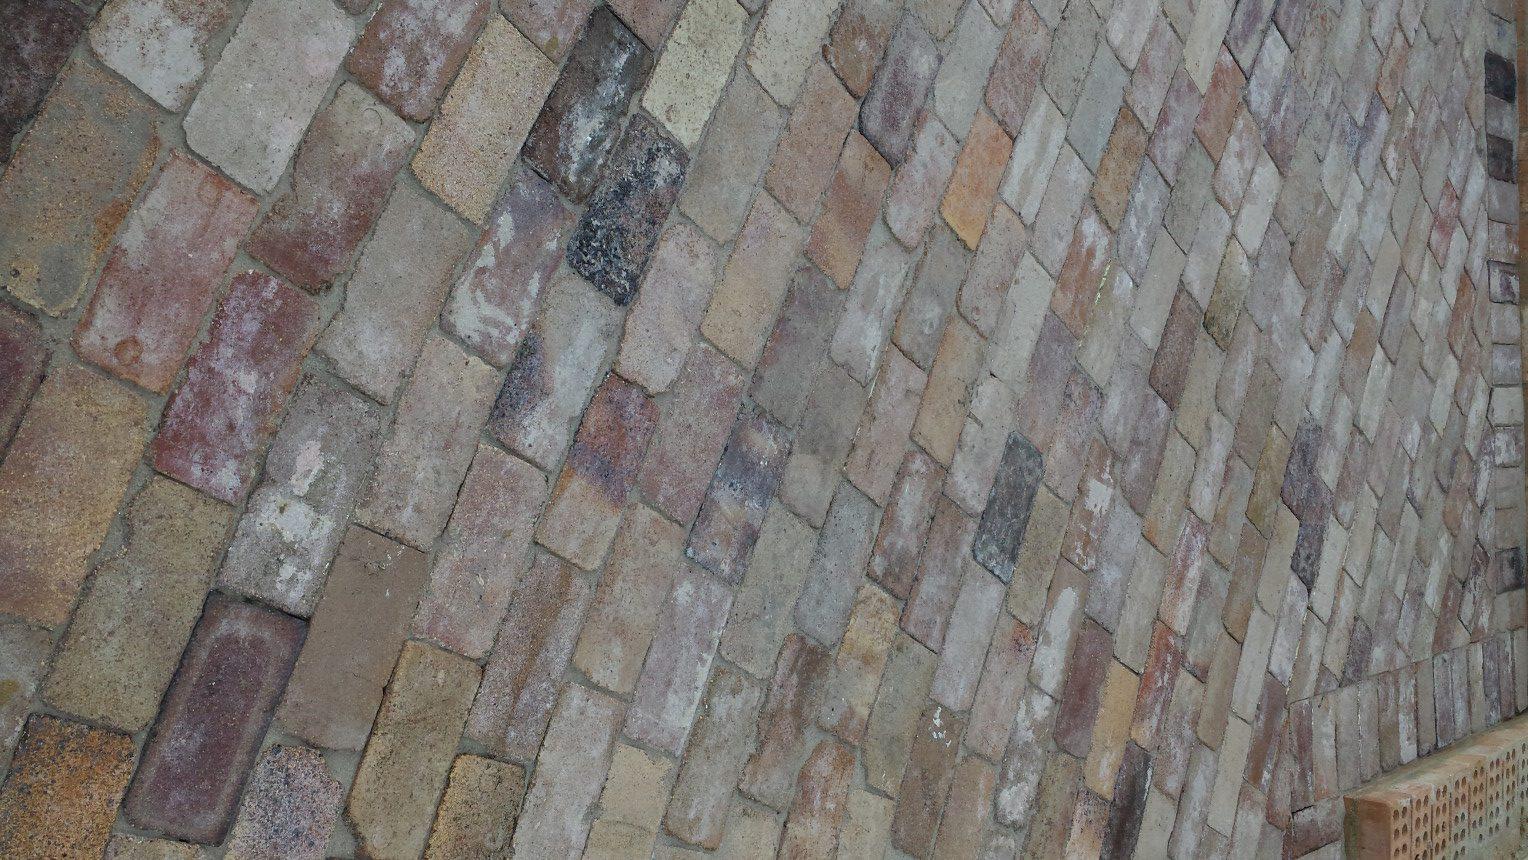 Pacific Brick Paving Newcastle - Paving Contractors